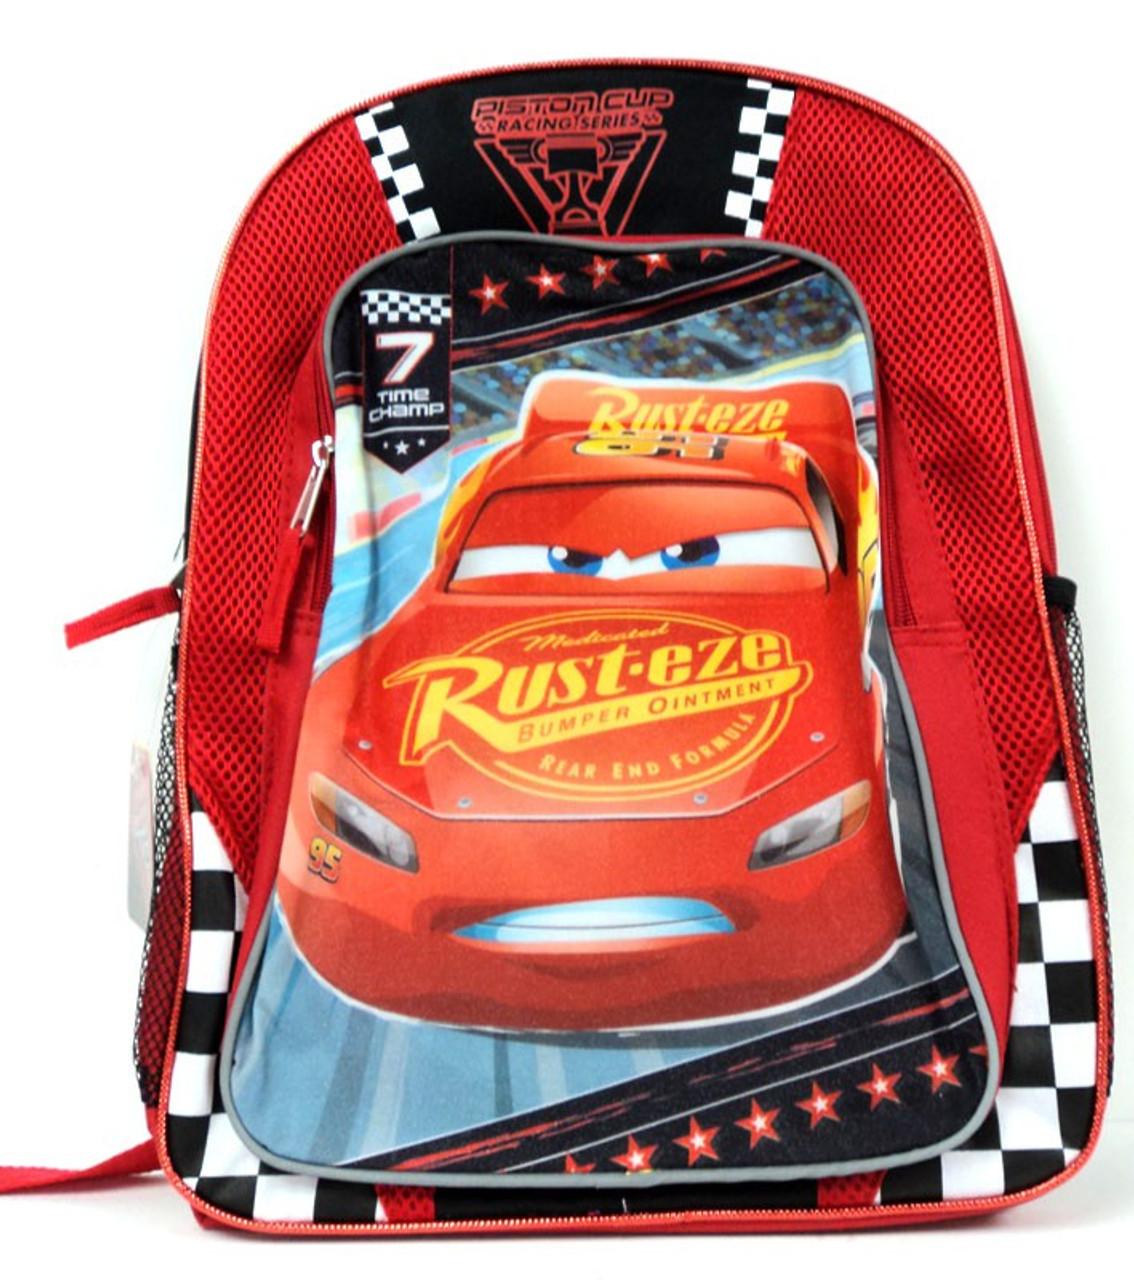 ba8ececf6fd Disney Pixar Cars Cars 3 Rust-eze Backpack Fast Forward New York - ToyWiz